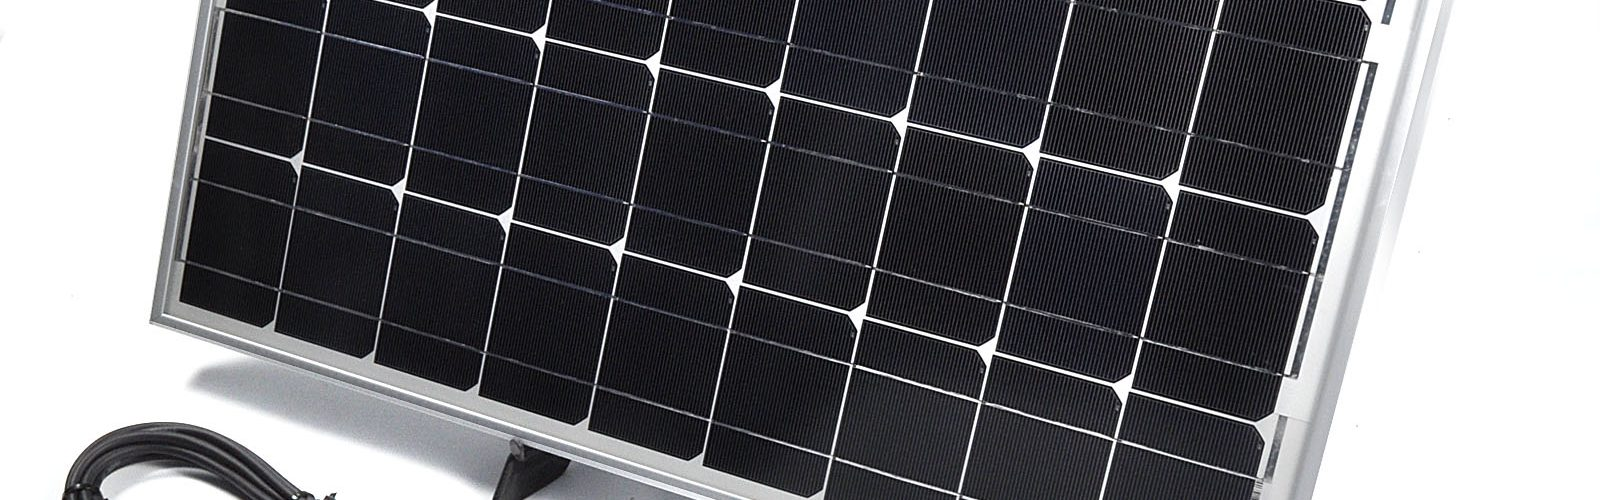 204. Utilizeaza baterii alimentate si incarcatoare solare